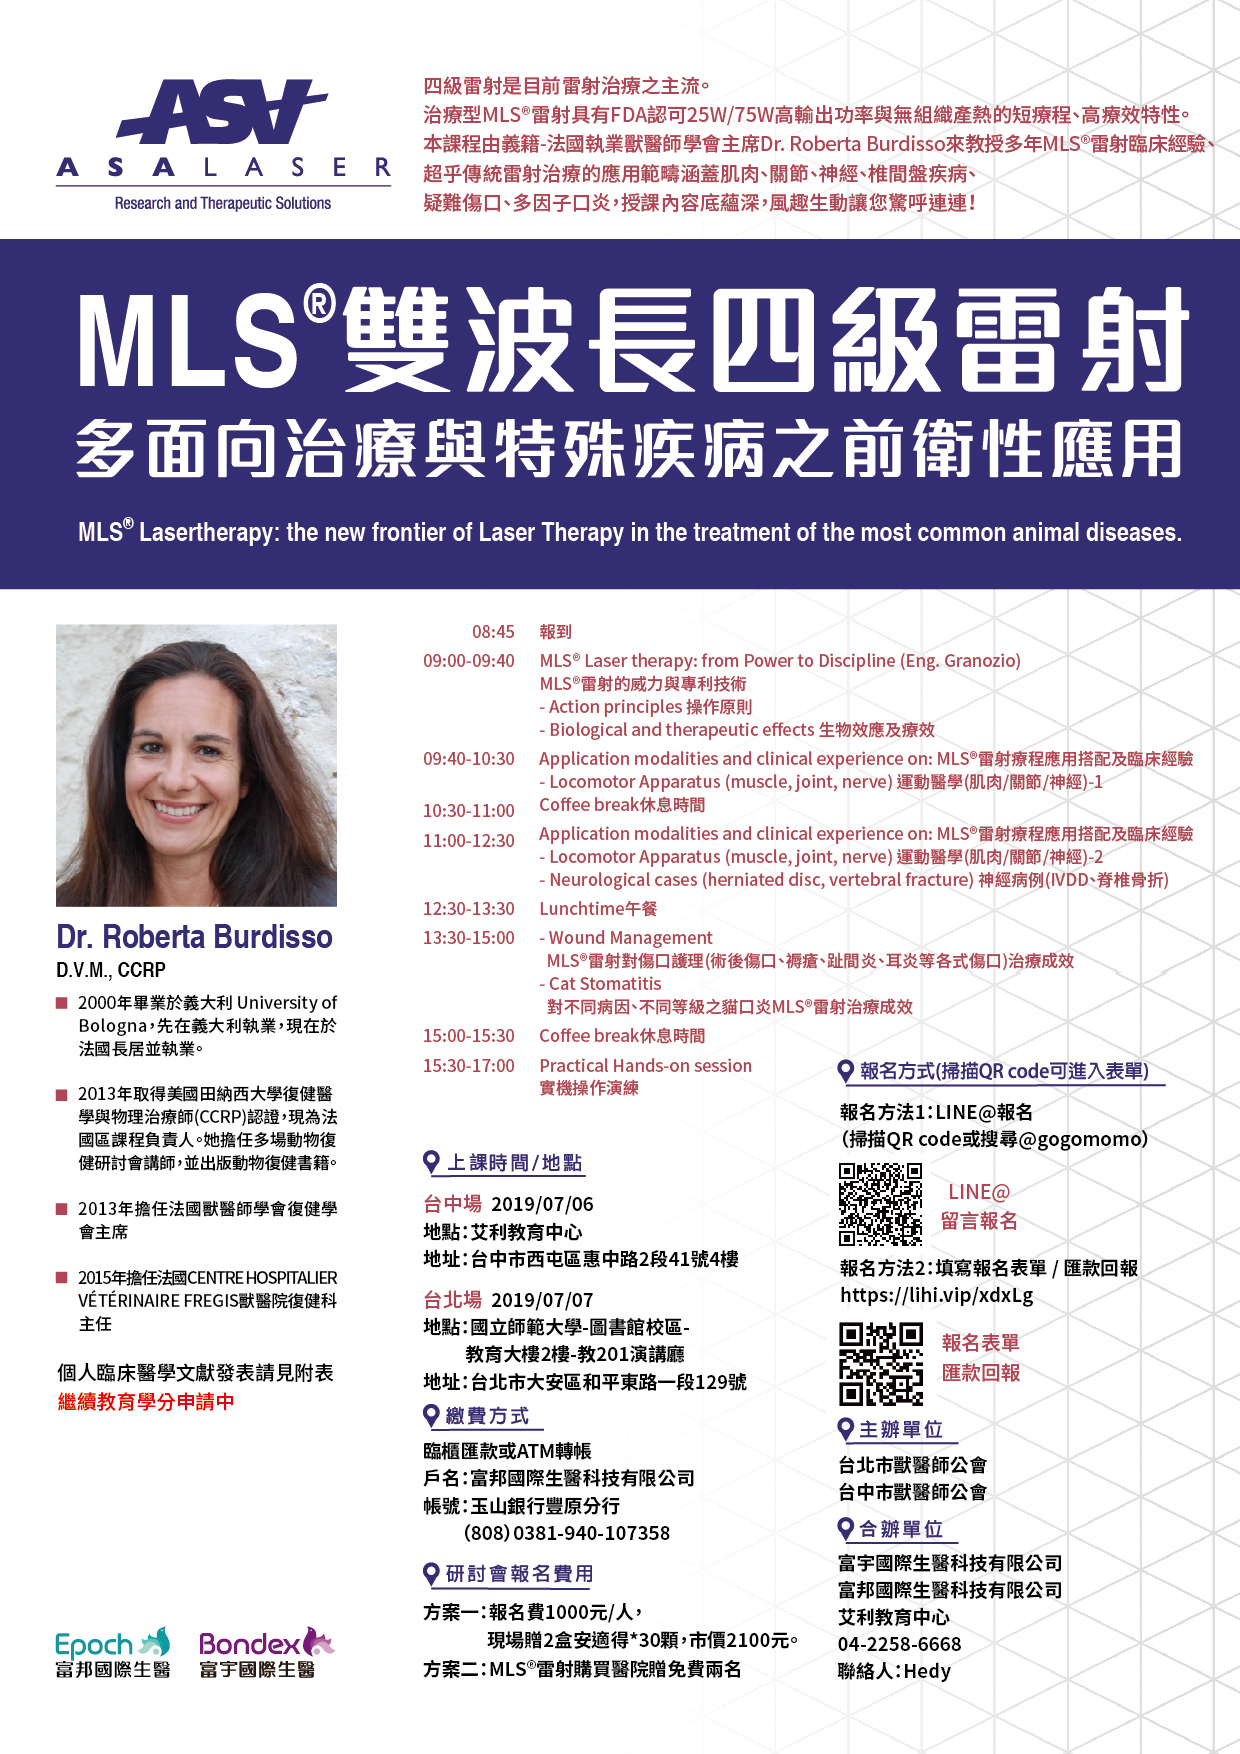 MLS® Workshop: treatment of common diseases, Taiwan